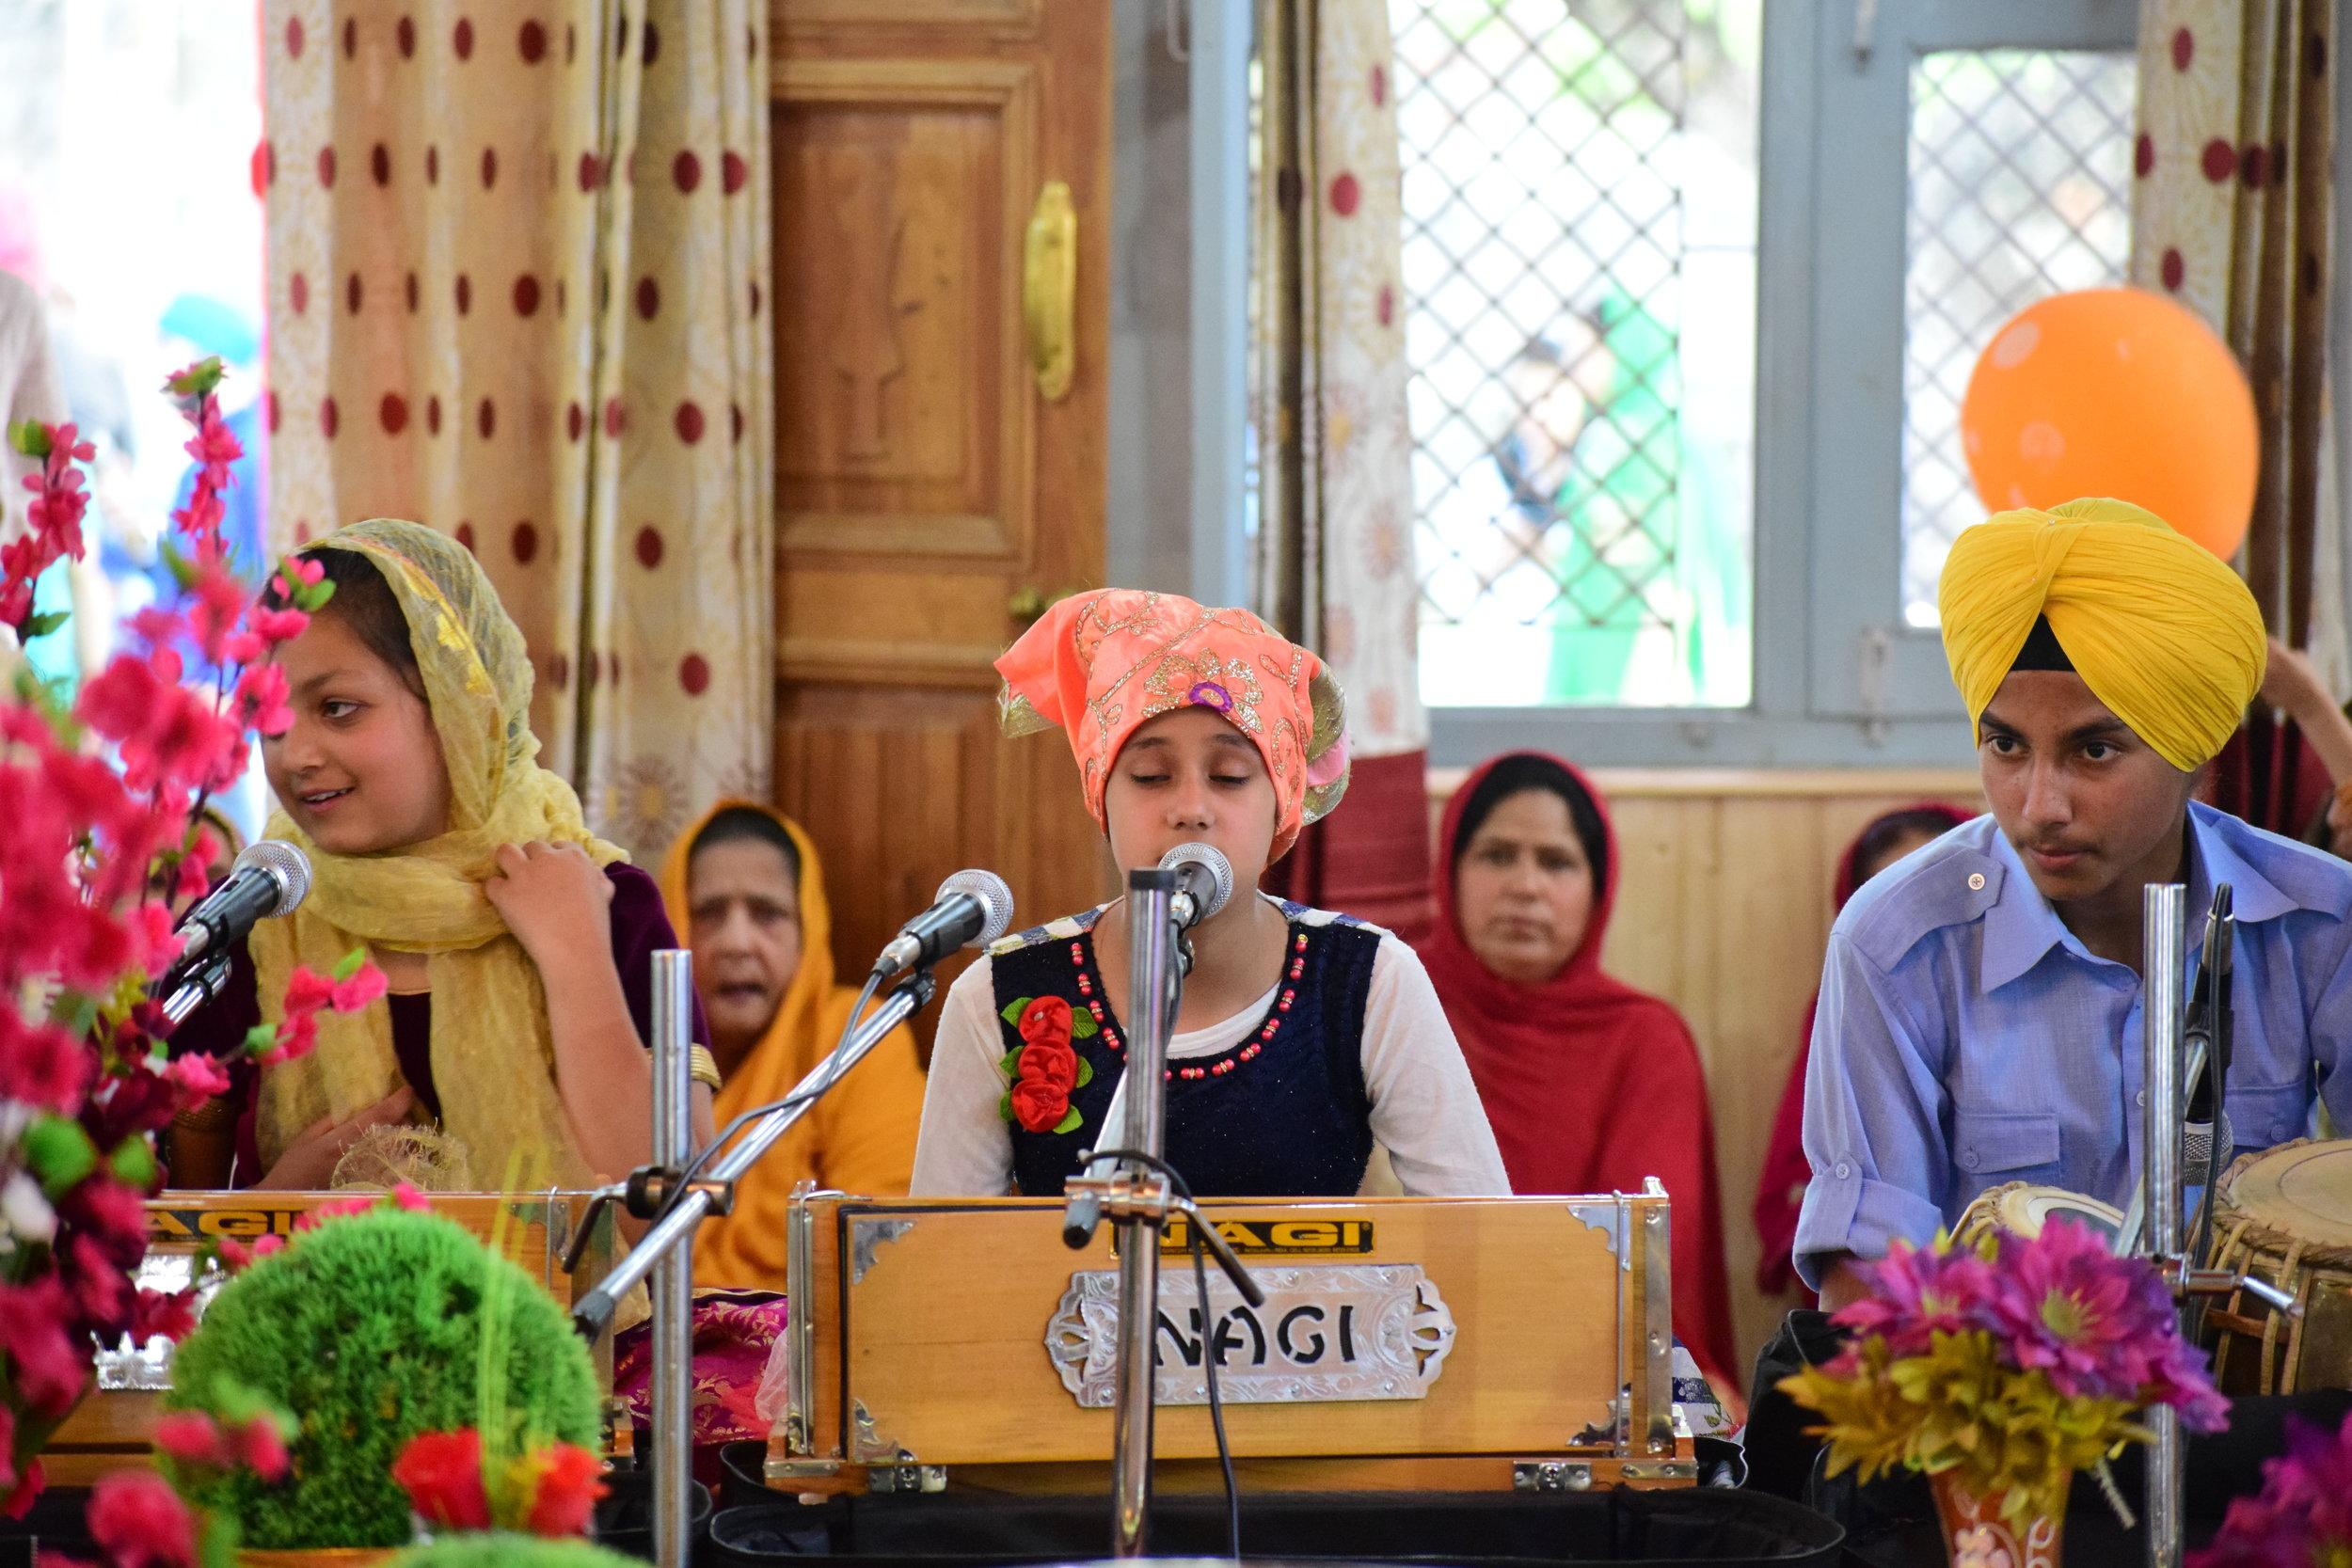 A young Kashmiri Sikh girl recites hymns during the celebrations of Guru Hargobind Singh's birthday. Photo by Karanjeet Singh.